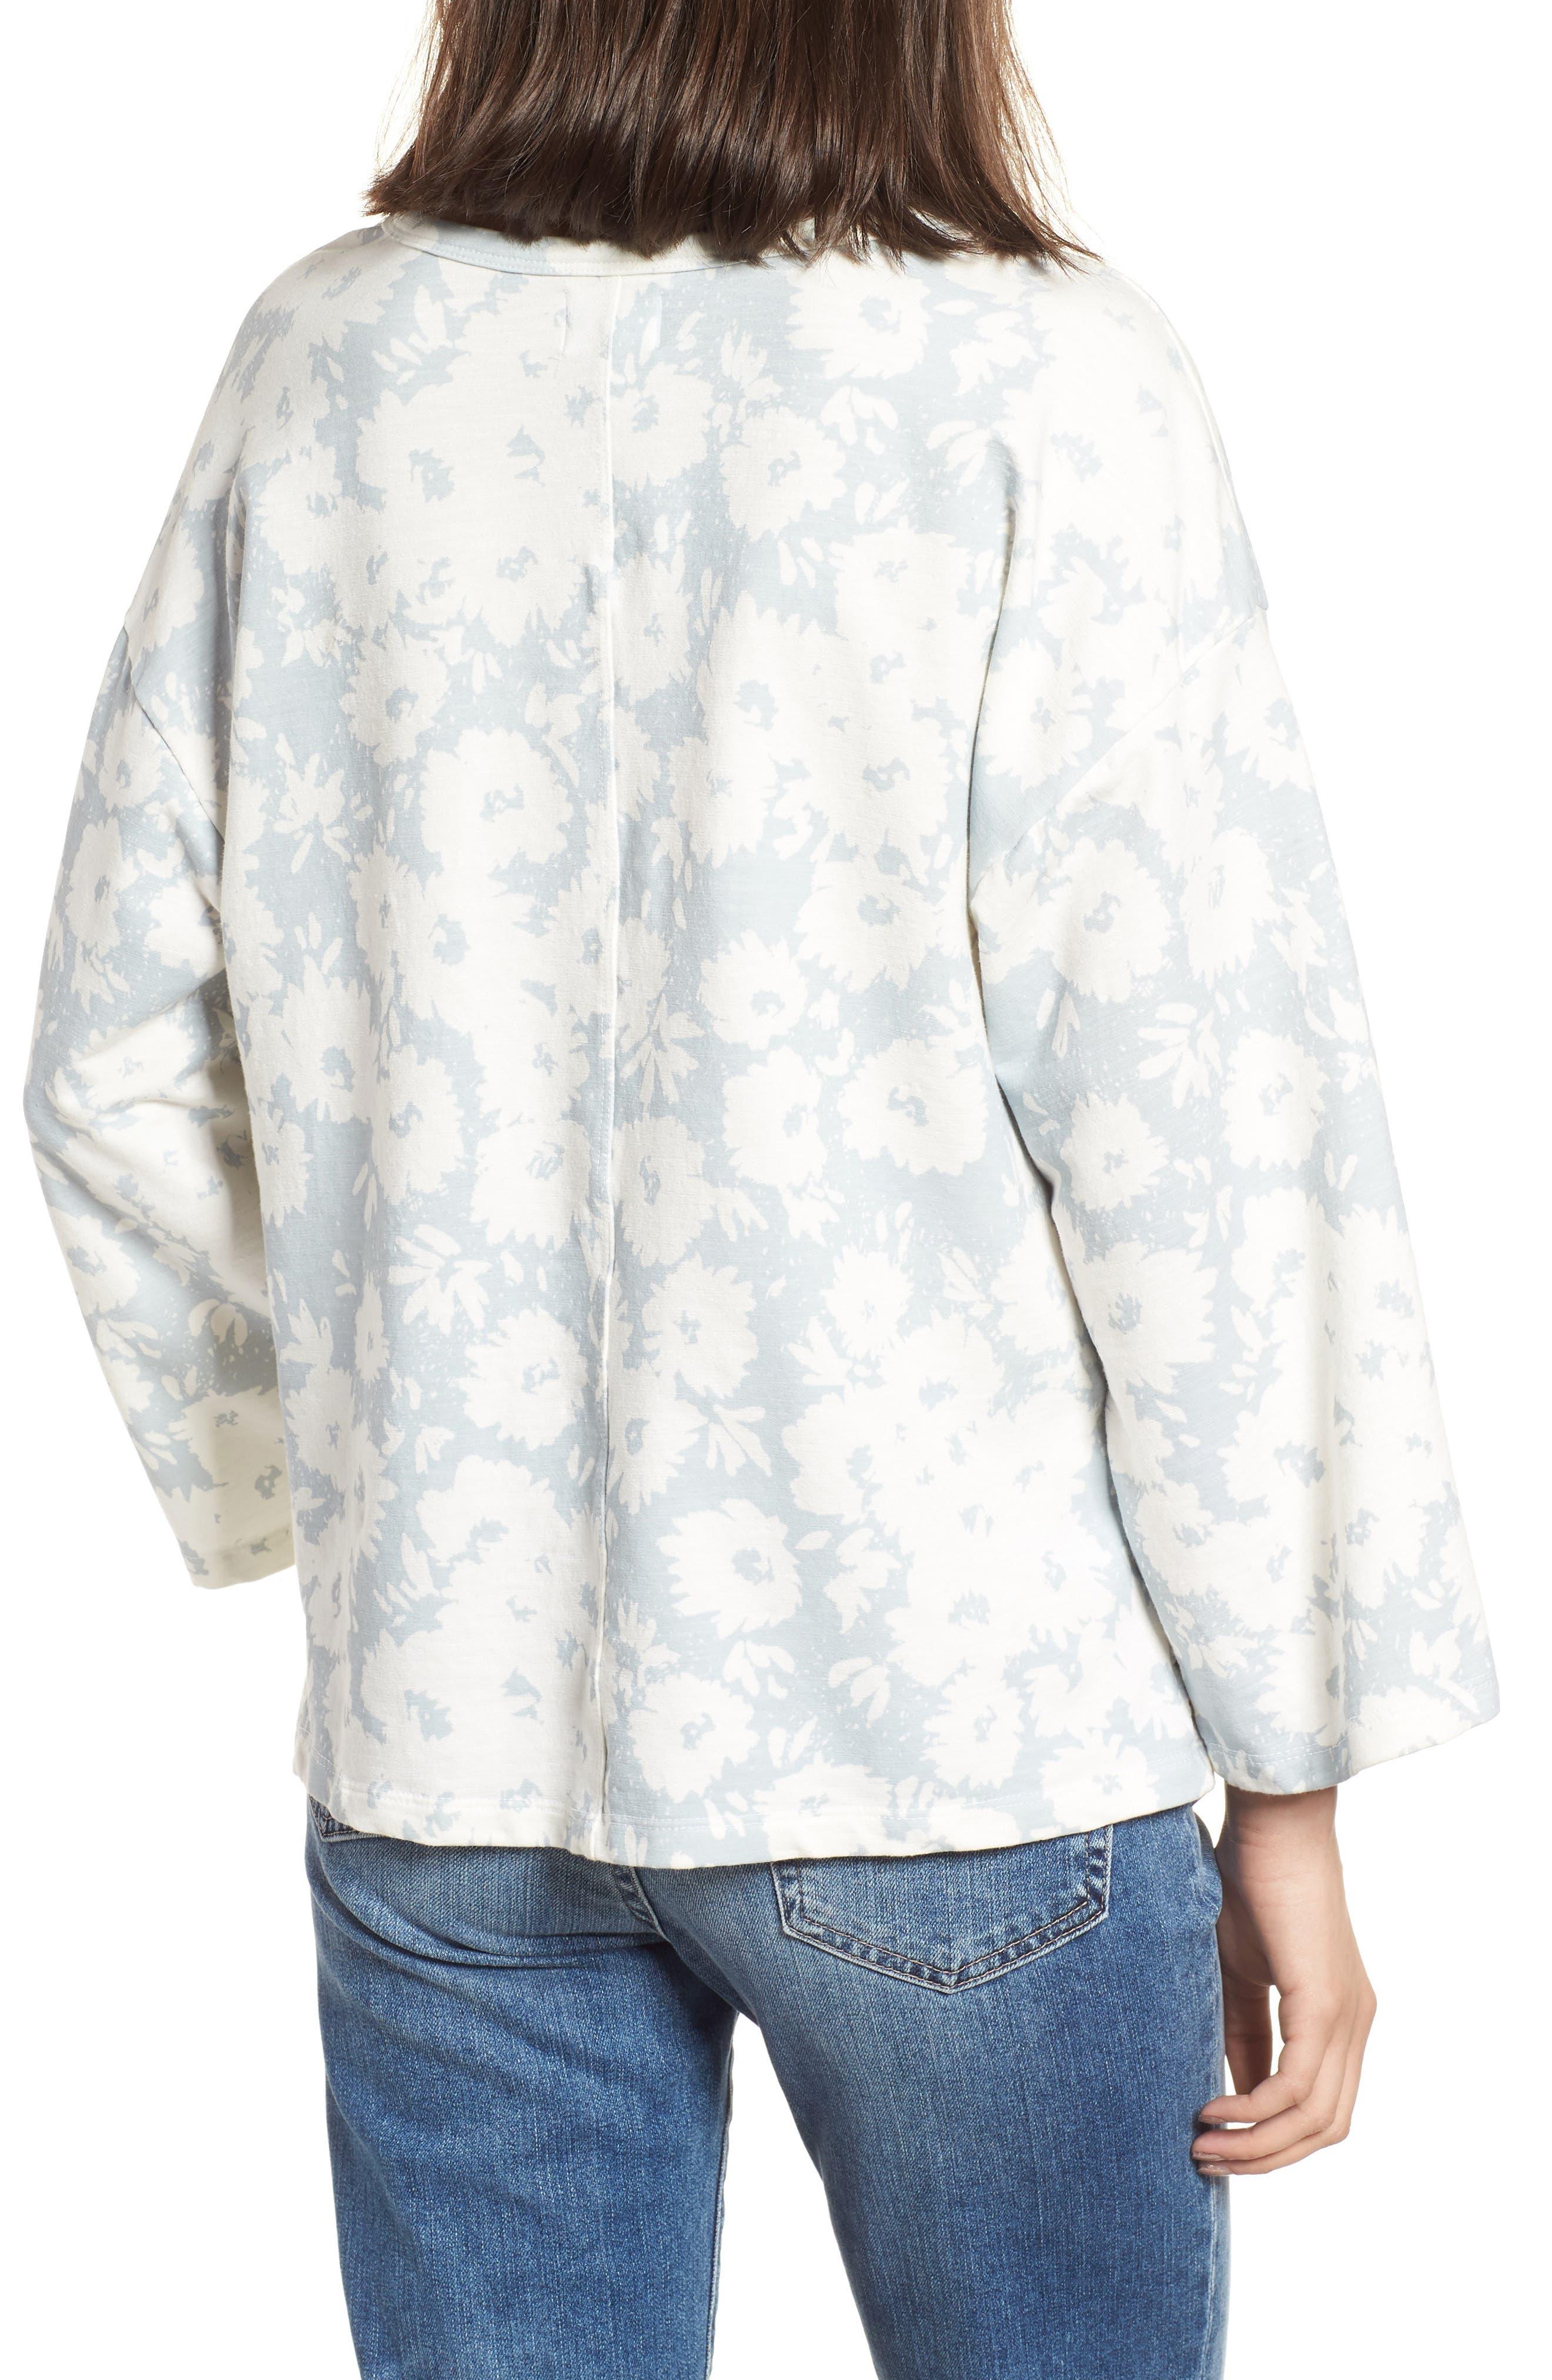 Kimono Sweatshirt,                             Alternate thumbnail 2, color,                             Sky/ White